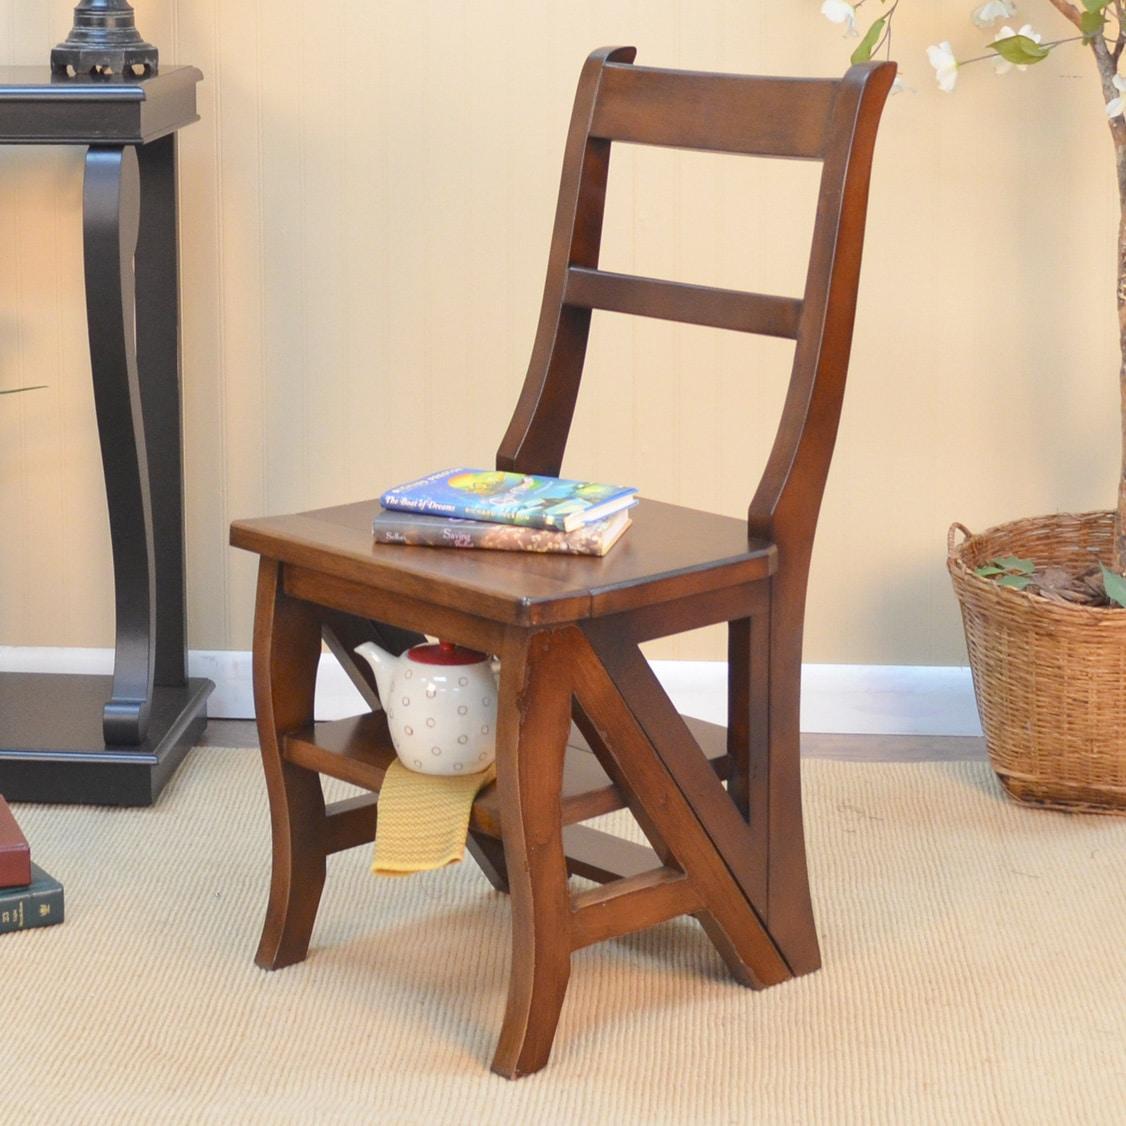 Carolina Folding Wood Library Ladder Chair (Chestnut), Brown